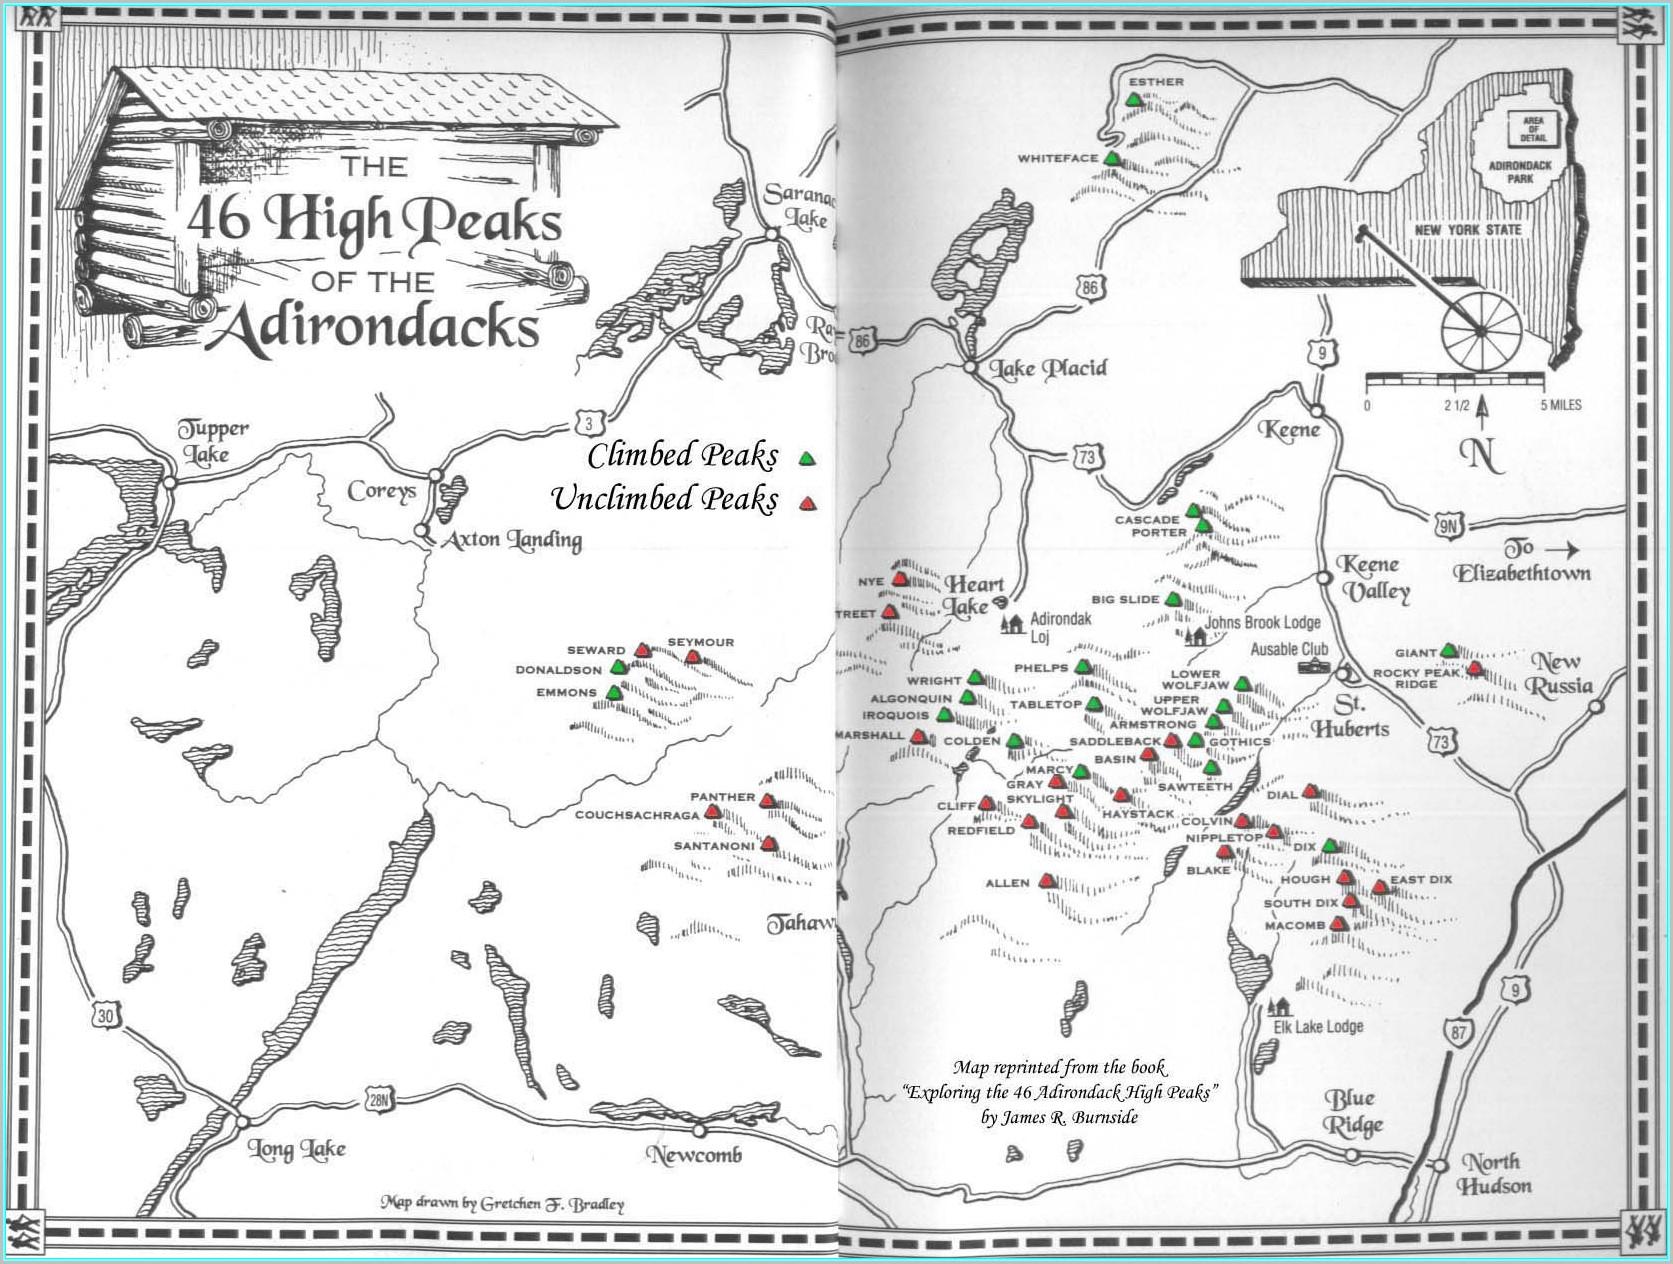 46 High Peaks Adirondacks Map